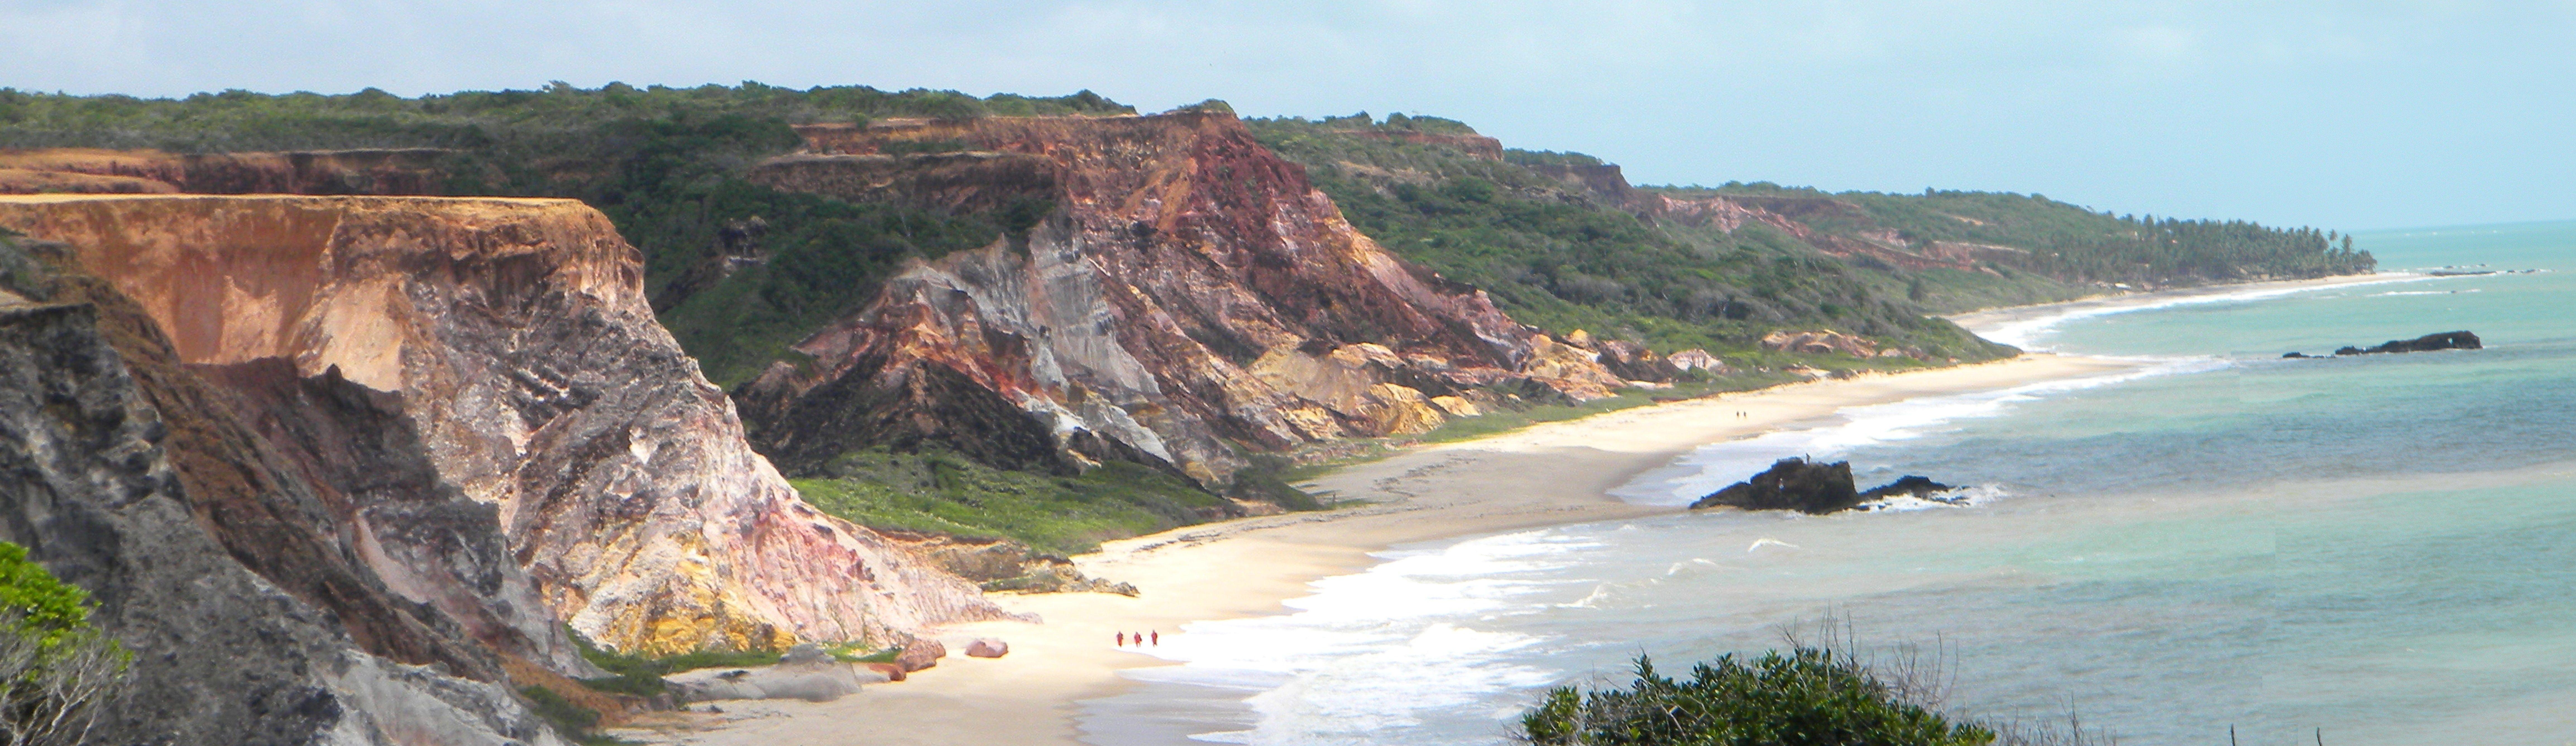 Tambaba Beach, Conde PB Brazil Stock Image - Image of